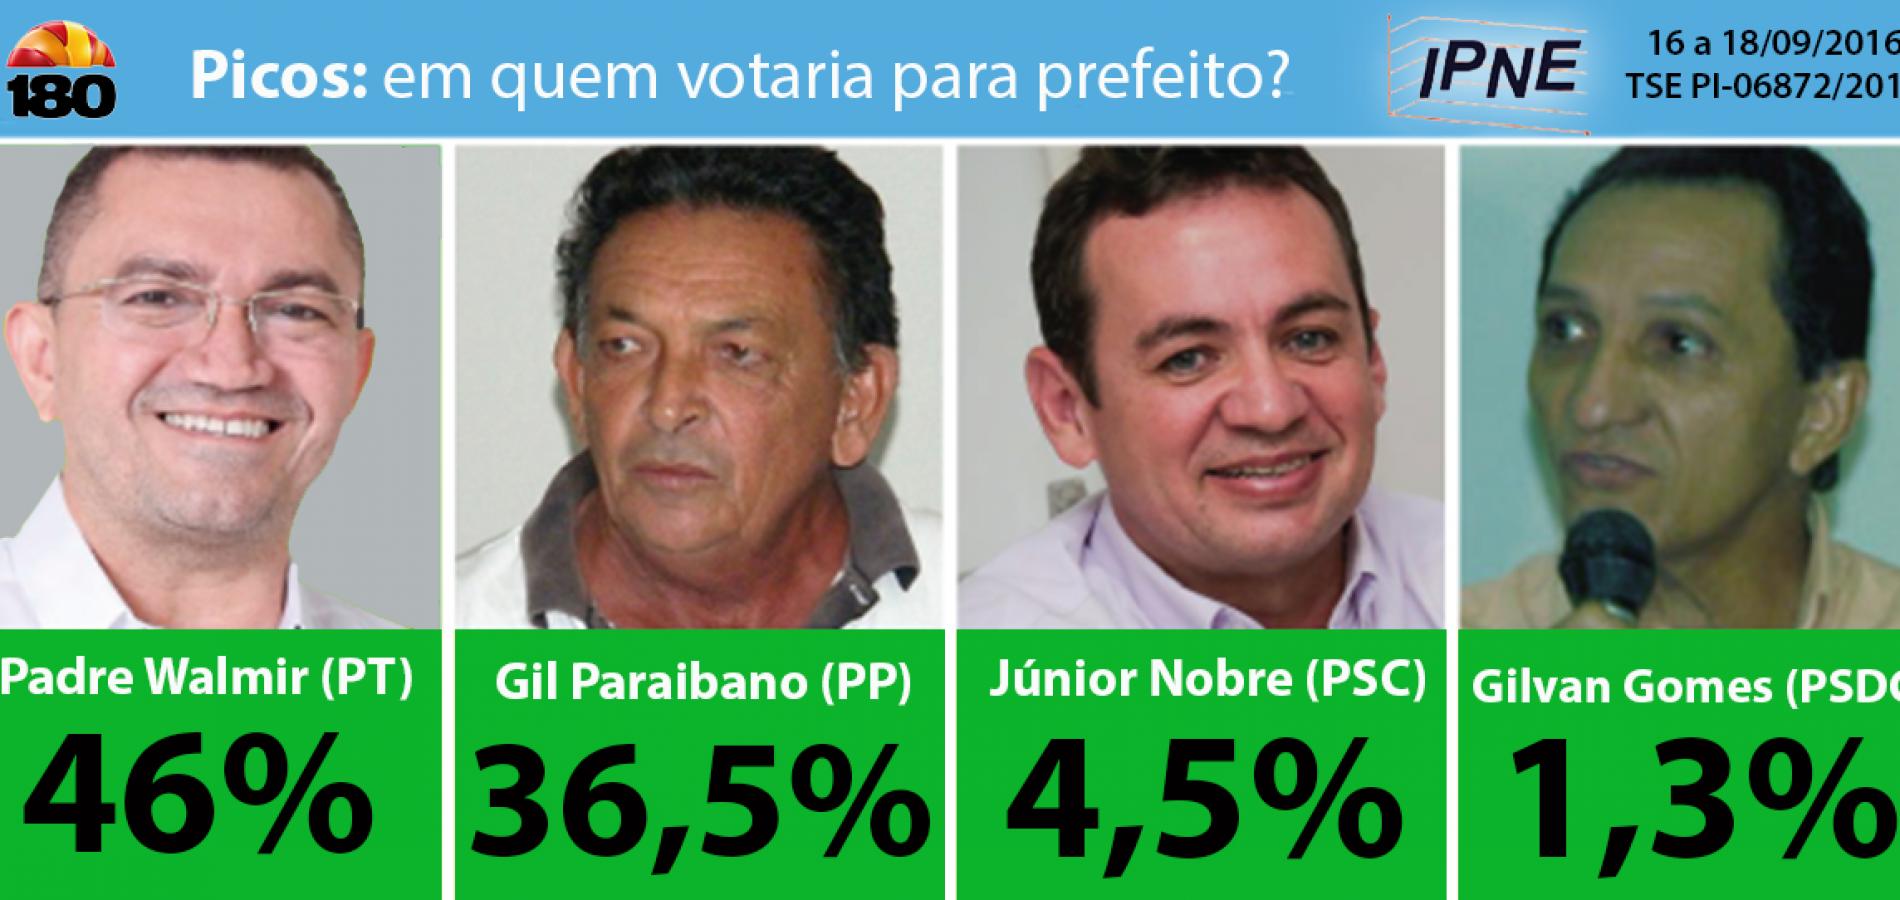 IPNE/Picos: Padre Walmir tem 46% e Gil Paraibano 36,5%